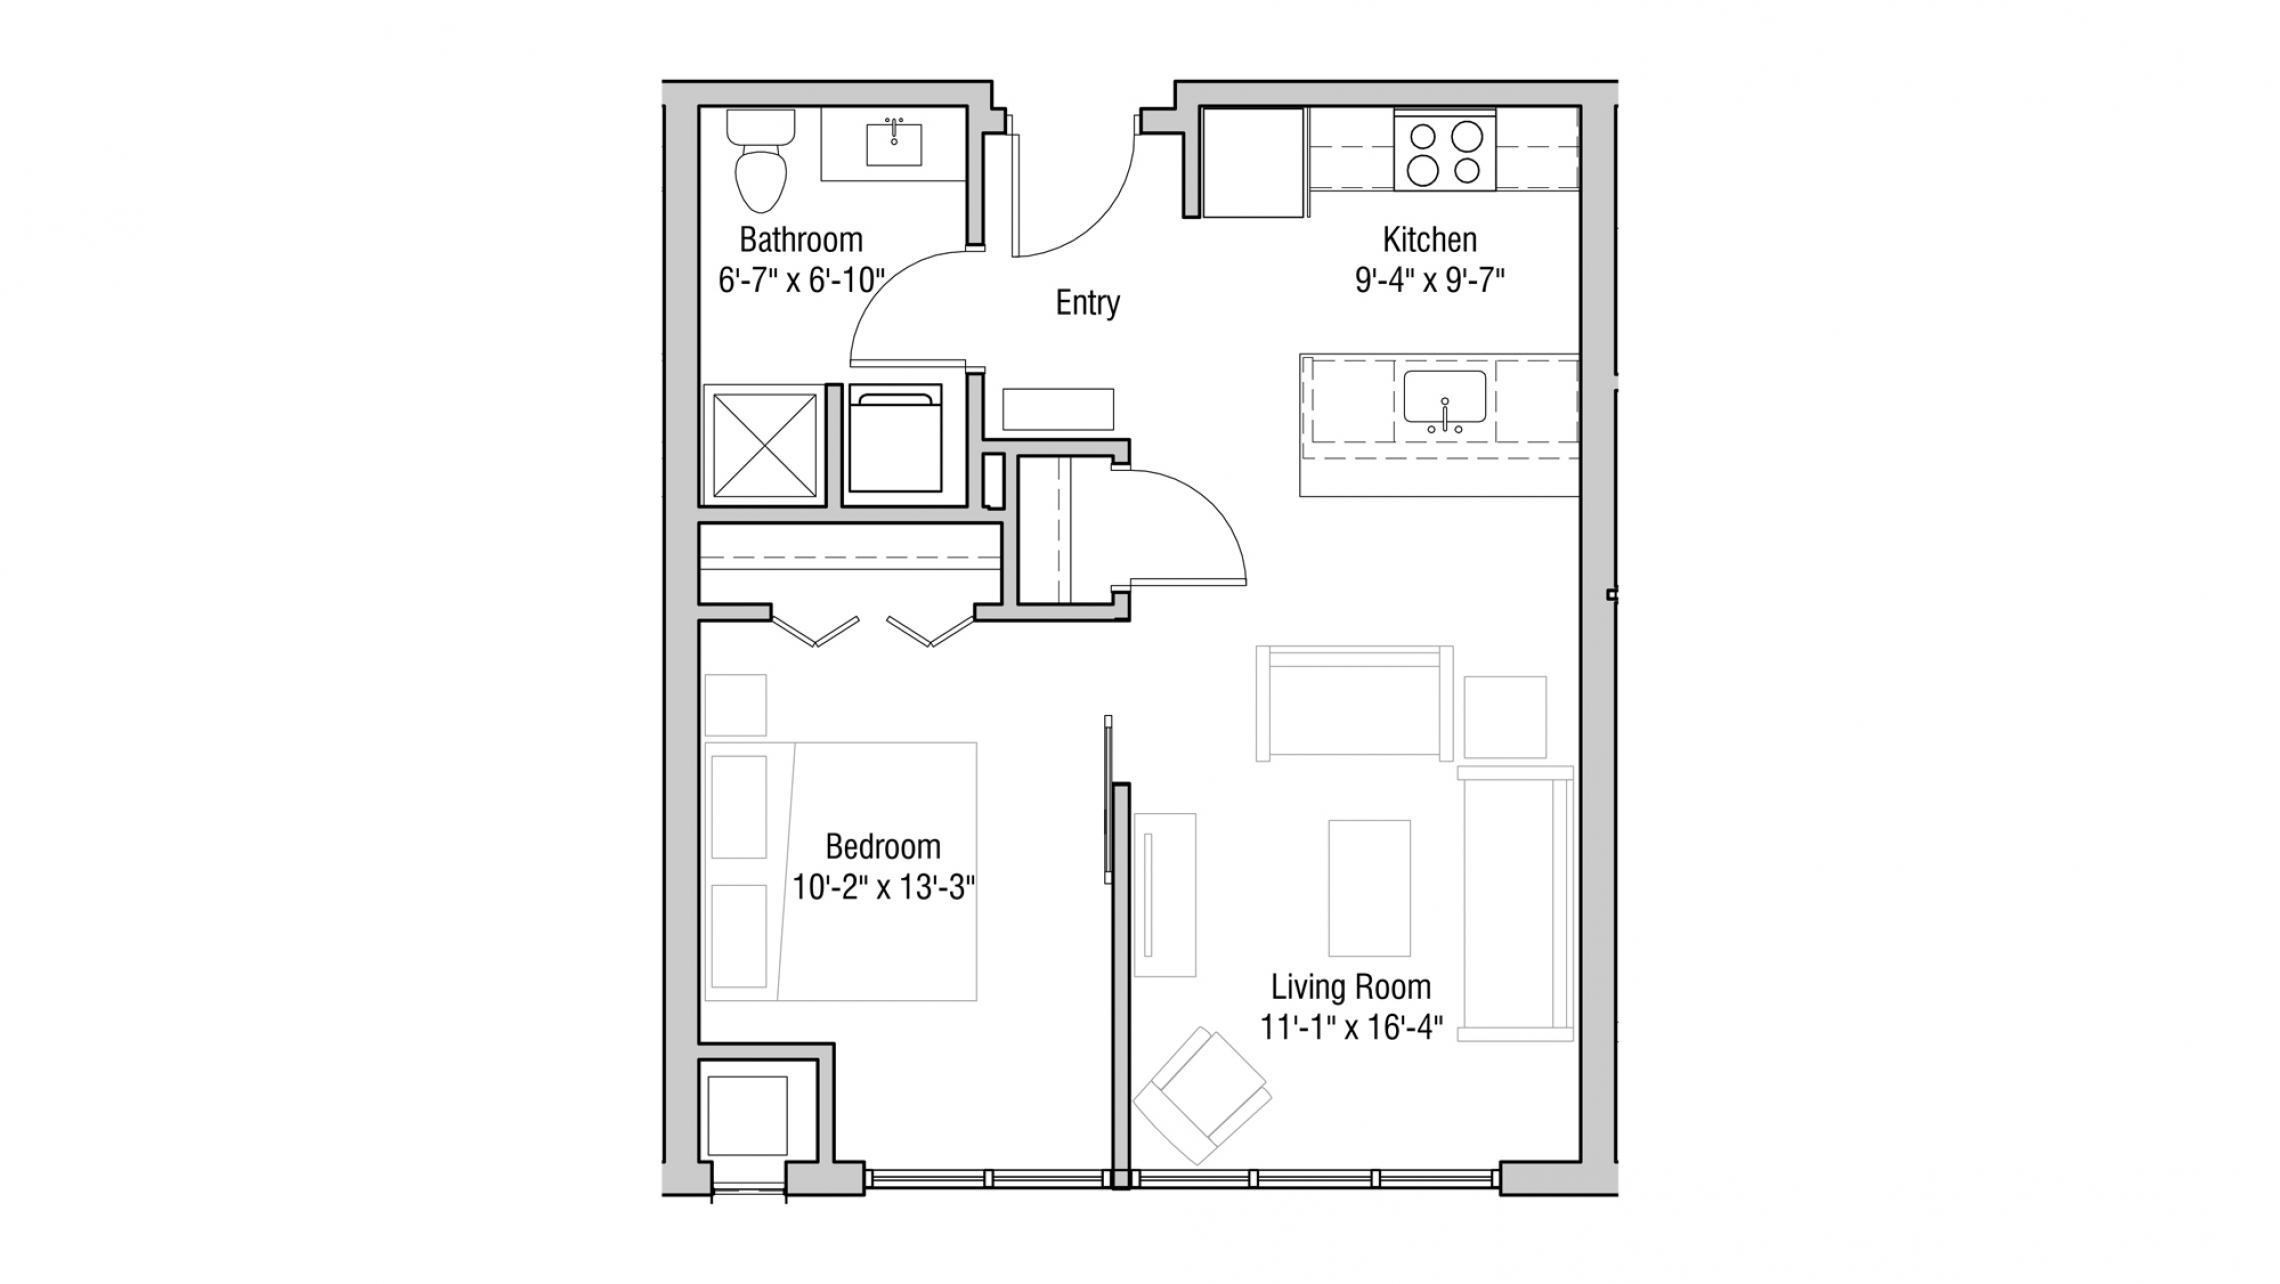 ULI Quarter Row 304 - One Bedroom, One Bathroom